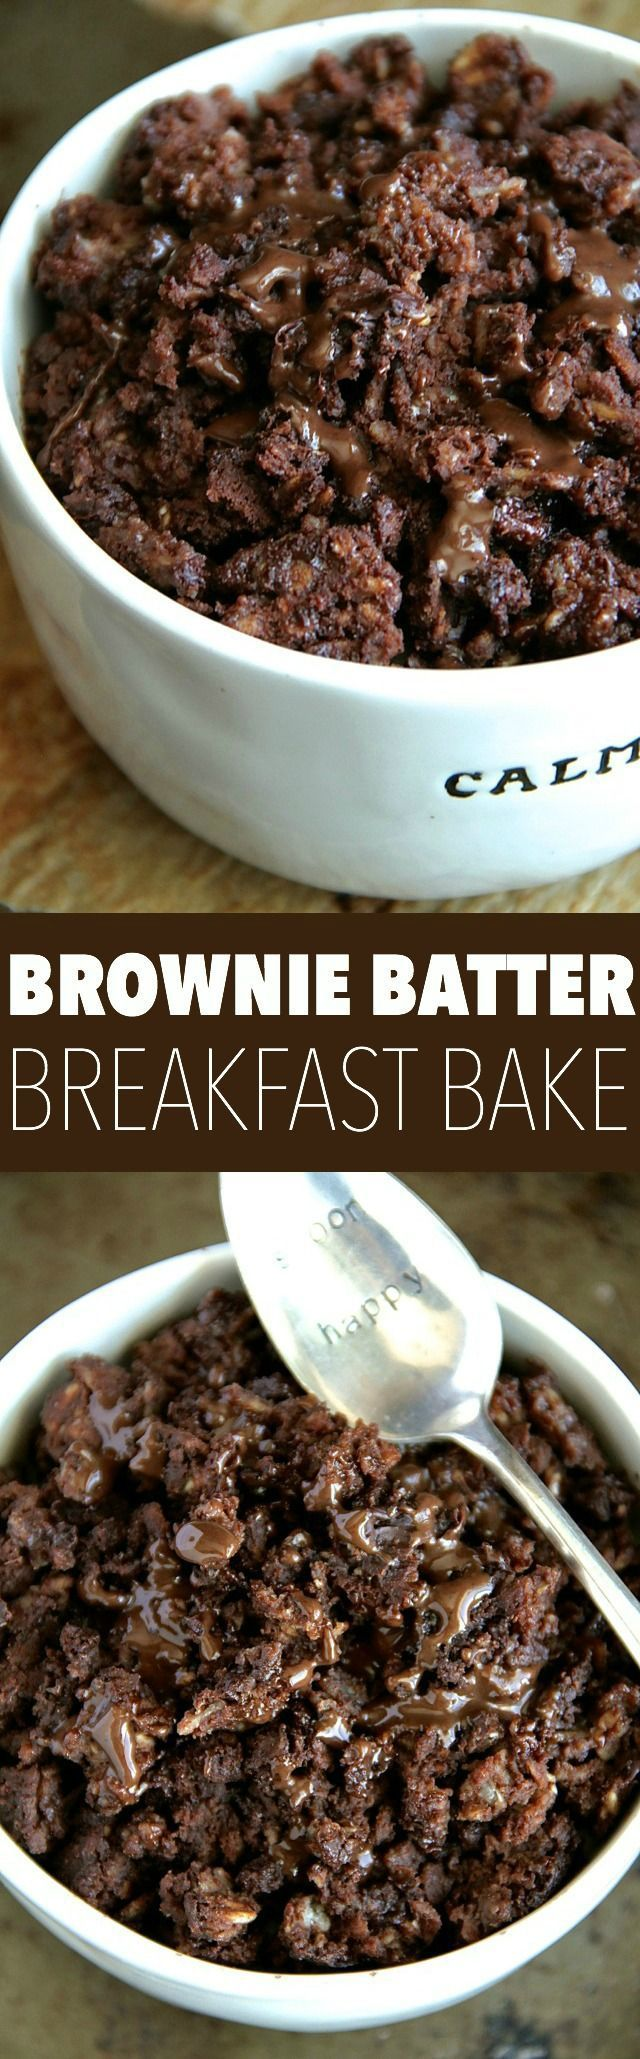 Brownie Batter Breakfast Bake -- Enjoy the rich chocolatey taste of brownies in a bowl that's healthy enough to eat for breakfast!    http://runningwithspoons.com #breakfast #vegan #chocolate